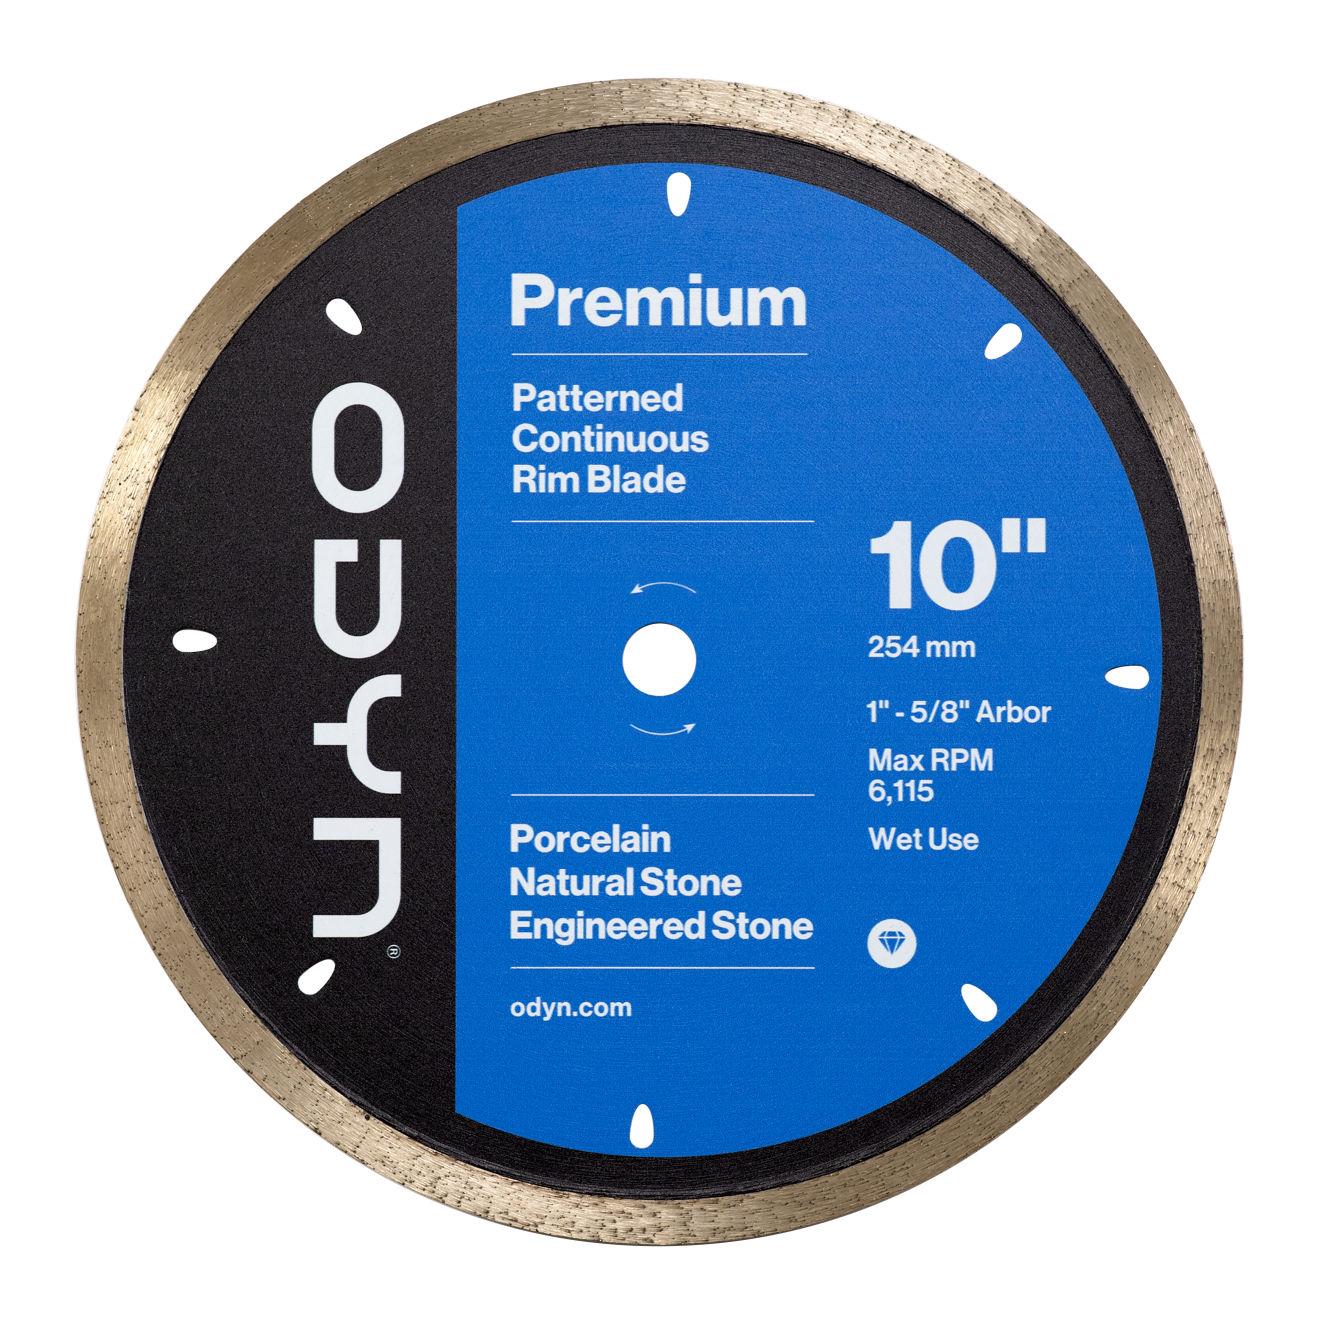 Odyn 10 in. Premium Pattern Continuous Rim Blade